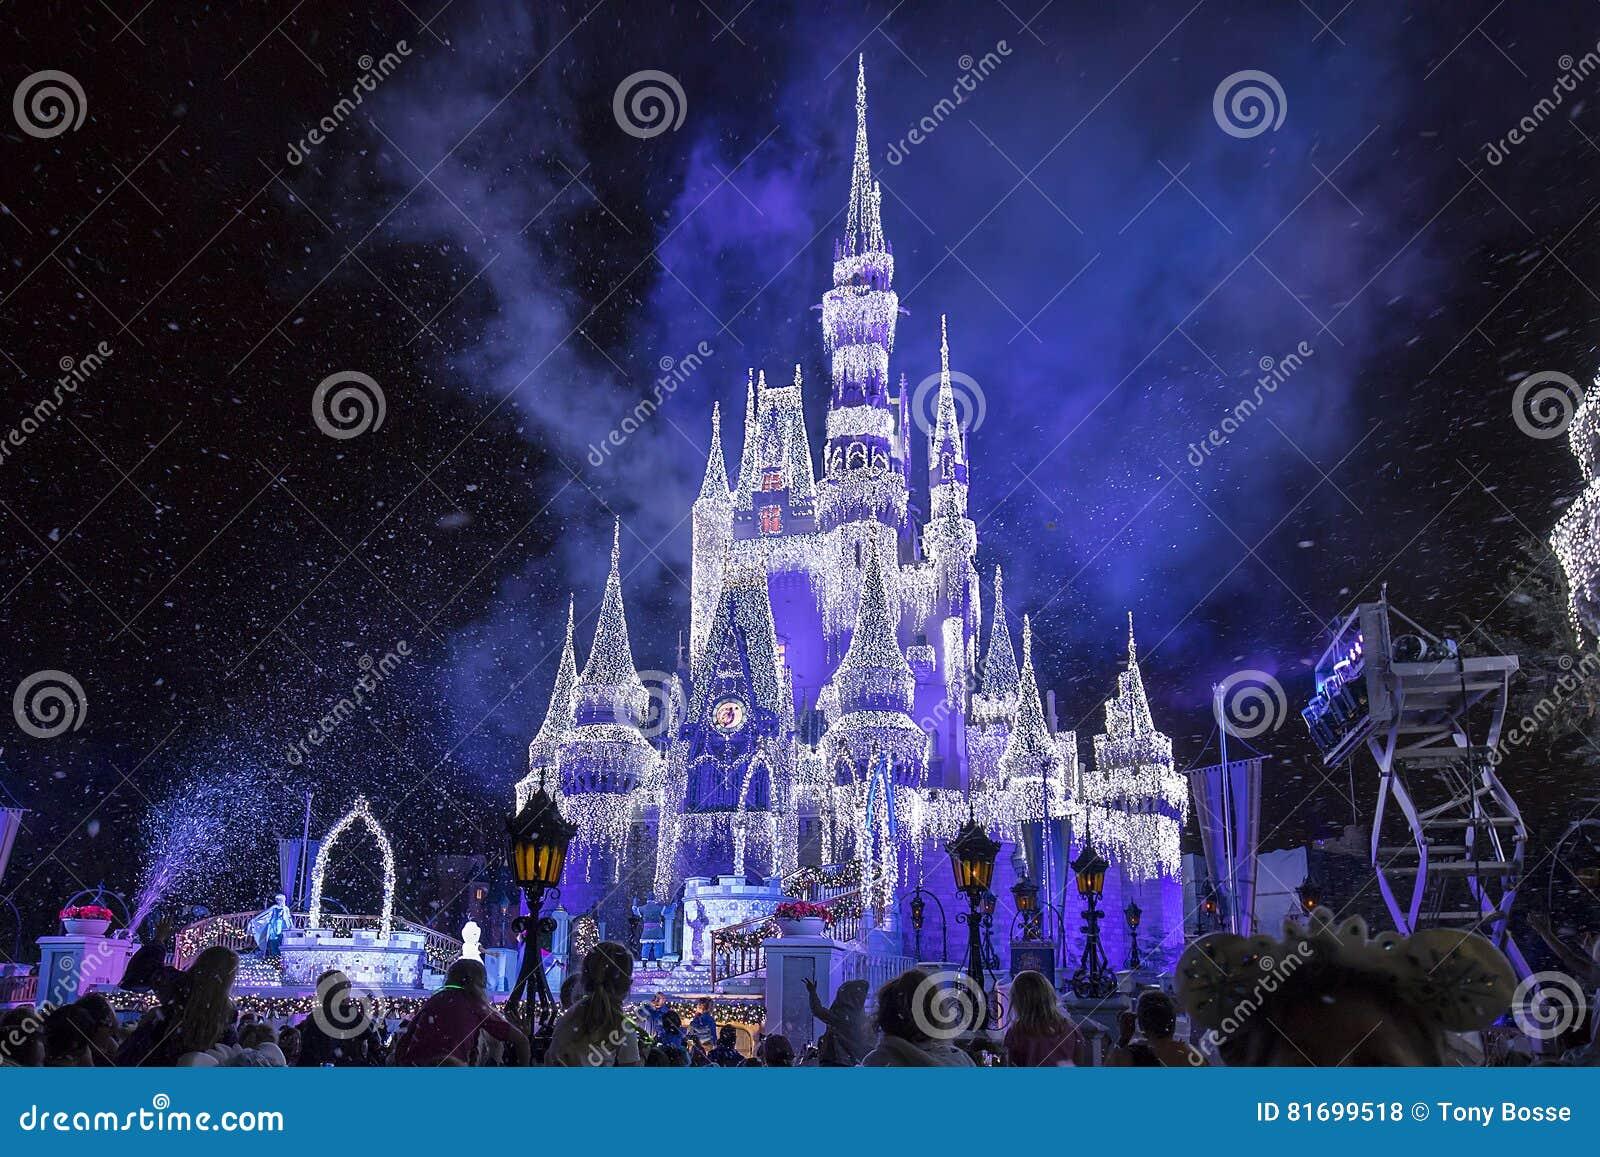 Cinderella Castle Christmas.Disney S Cinderella Castle With Christmas Icicles Editorial